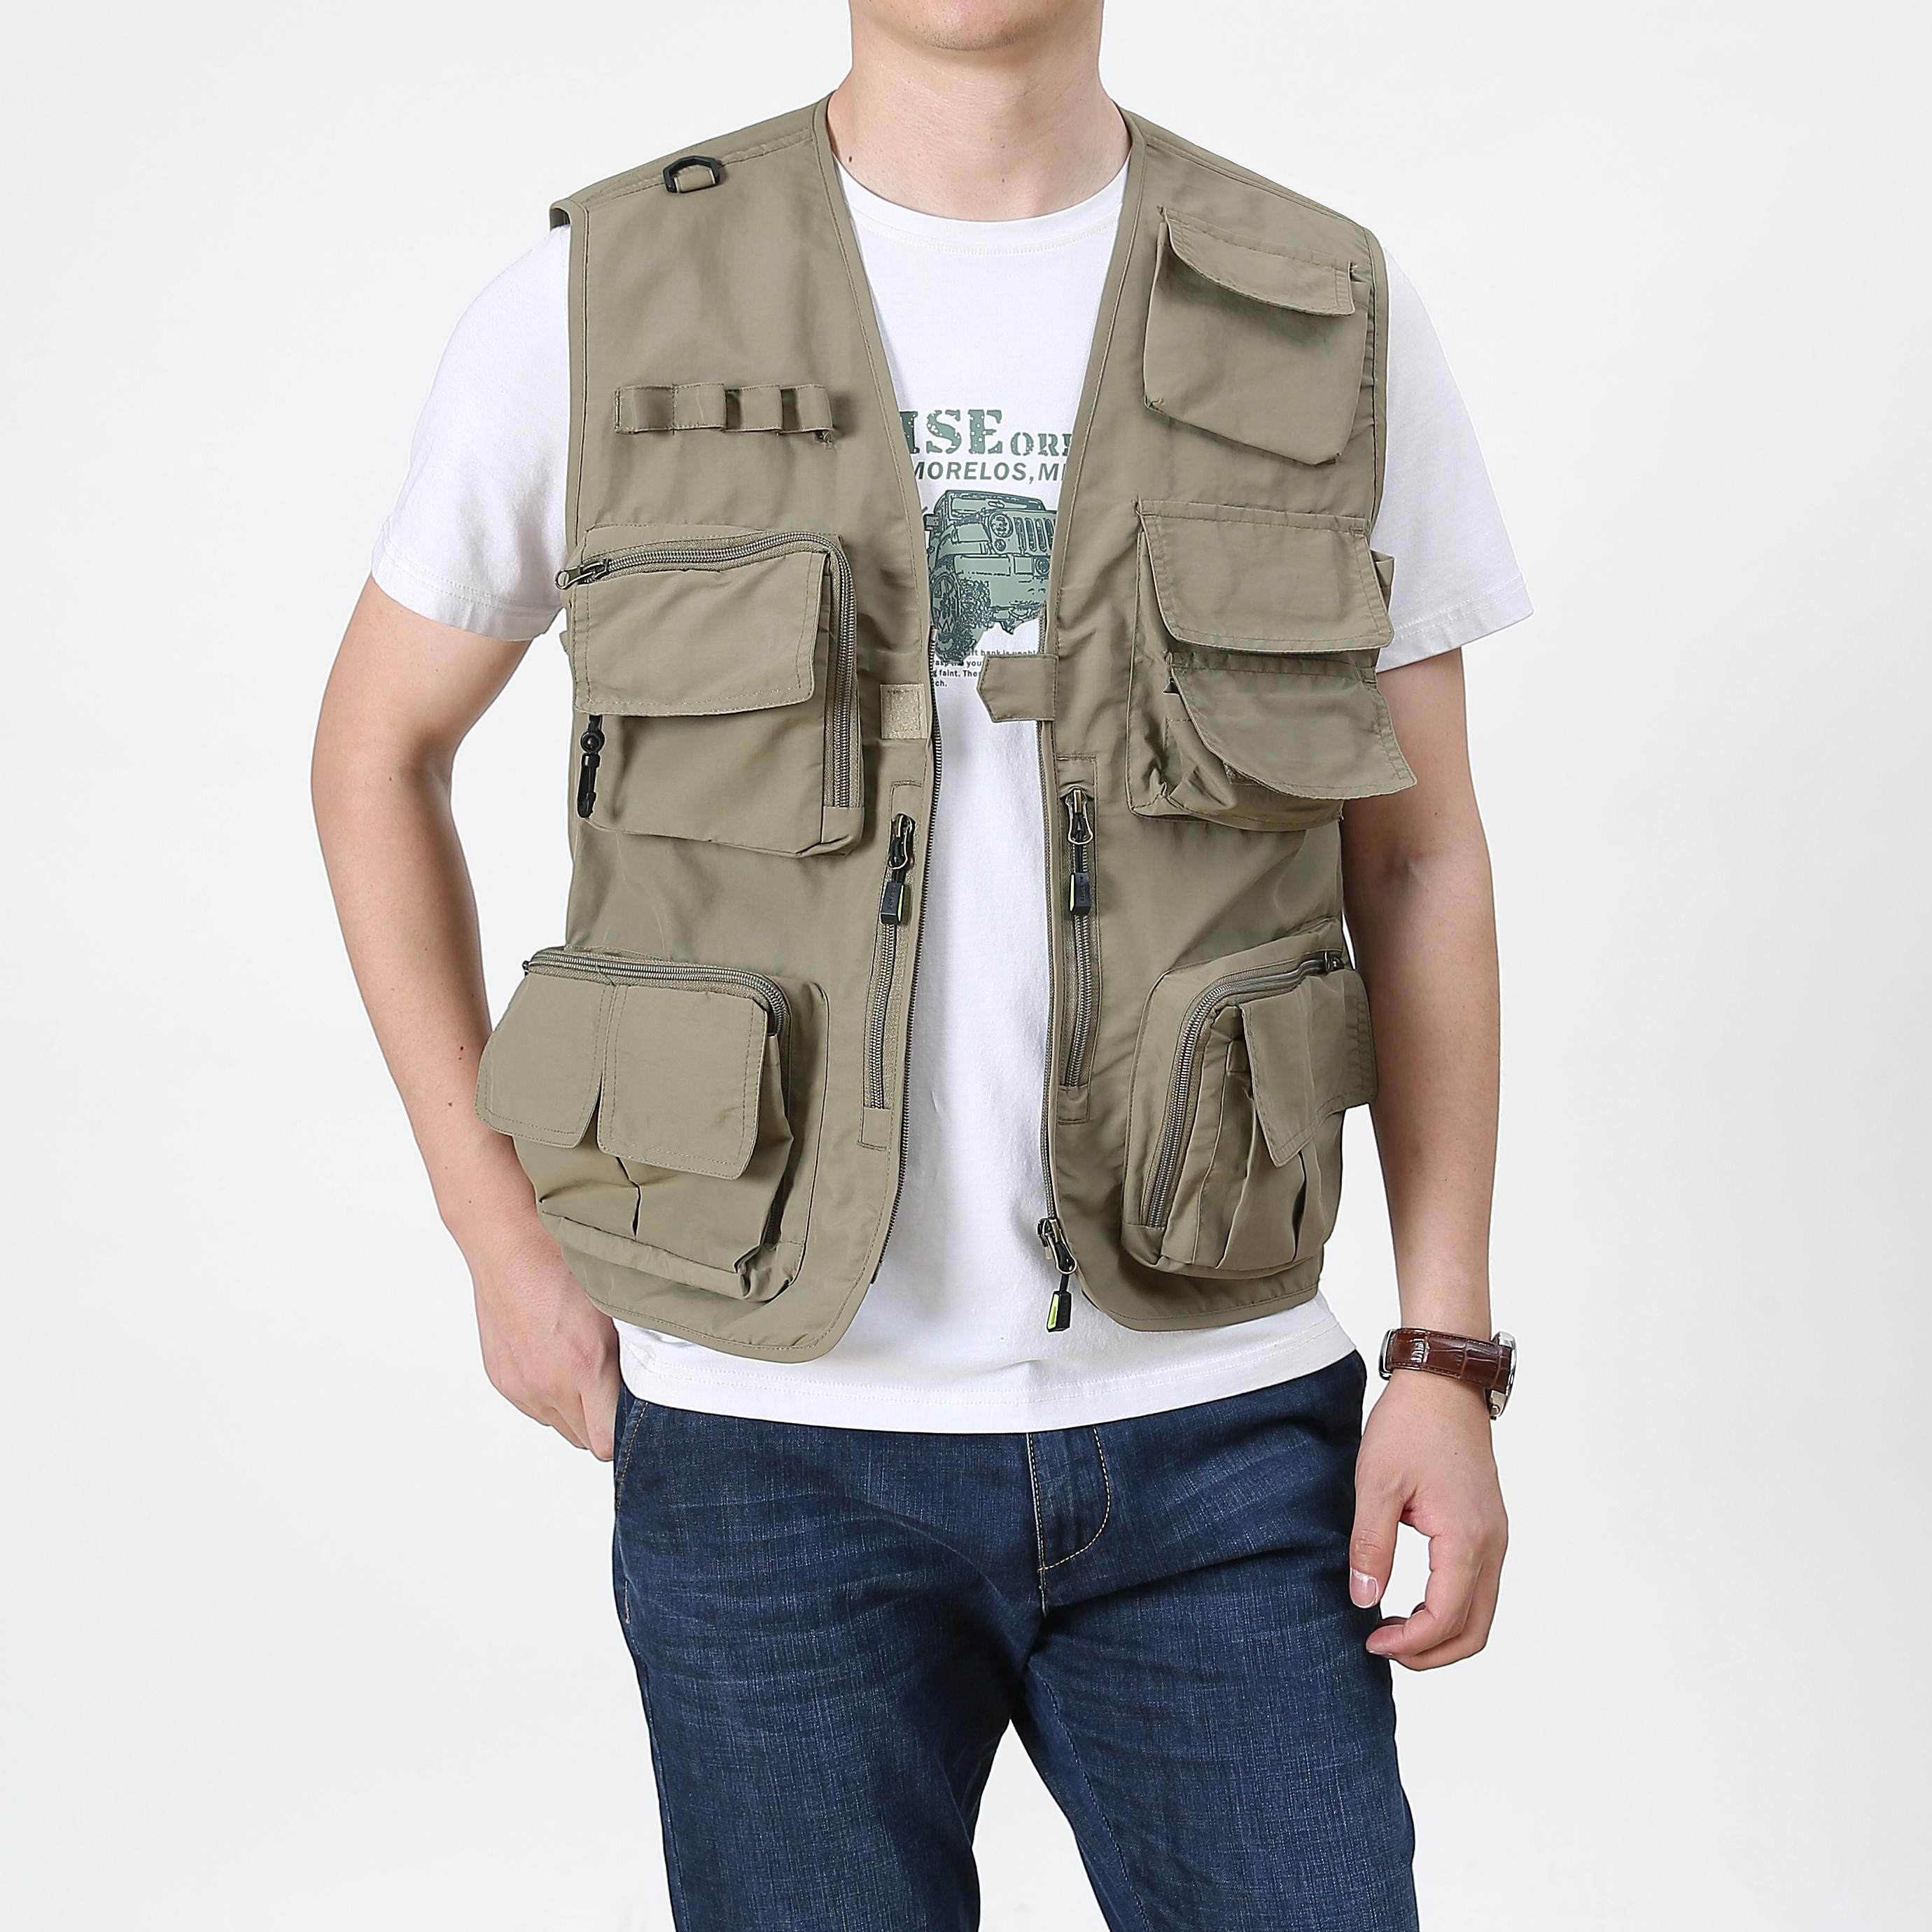 Hot Sale Practical Side Fish Net Fishing Hiking Spring&Autumn Plain Color Men Outwear Outdoor Vest Jacket